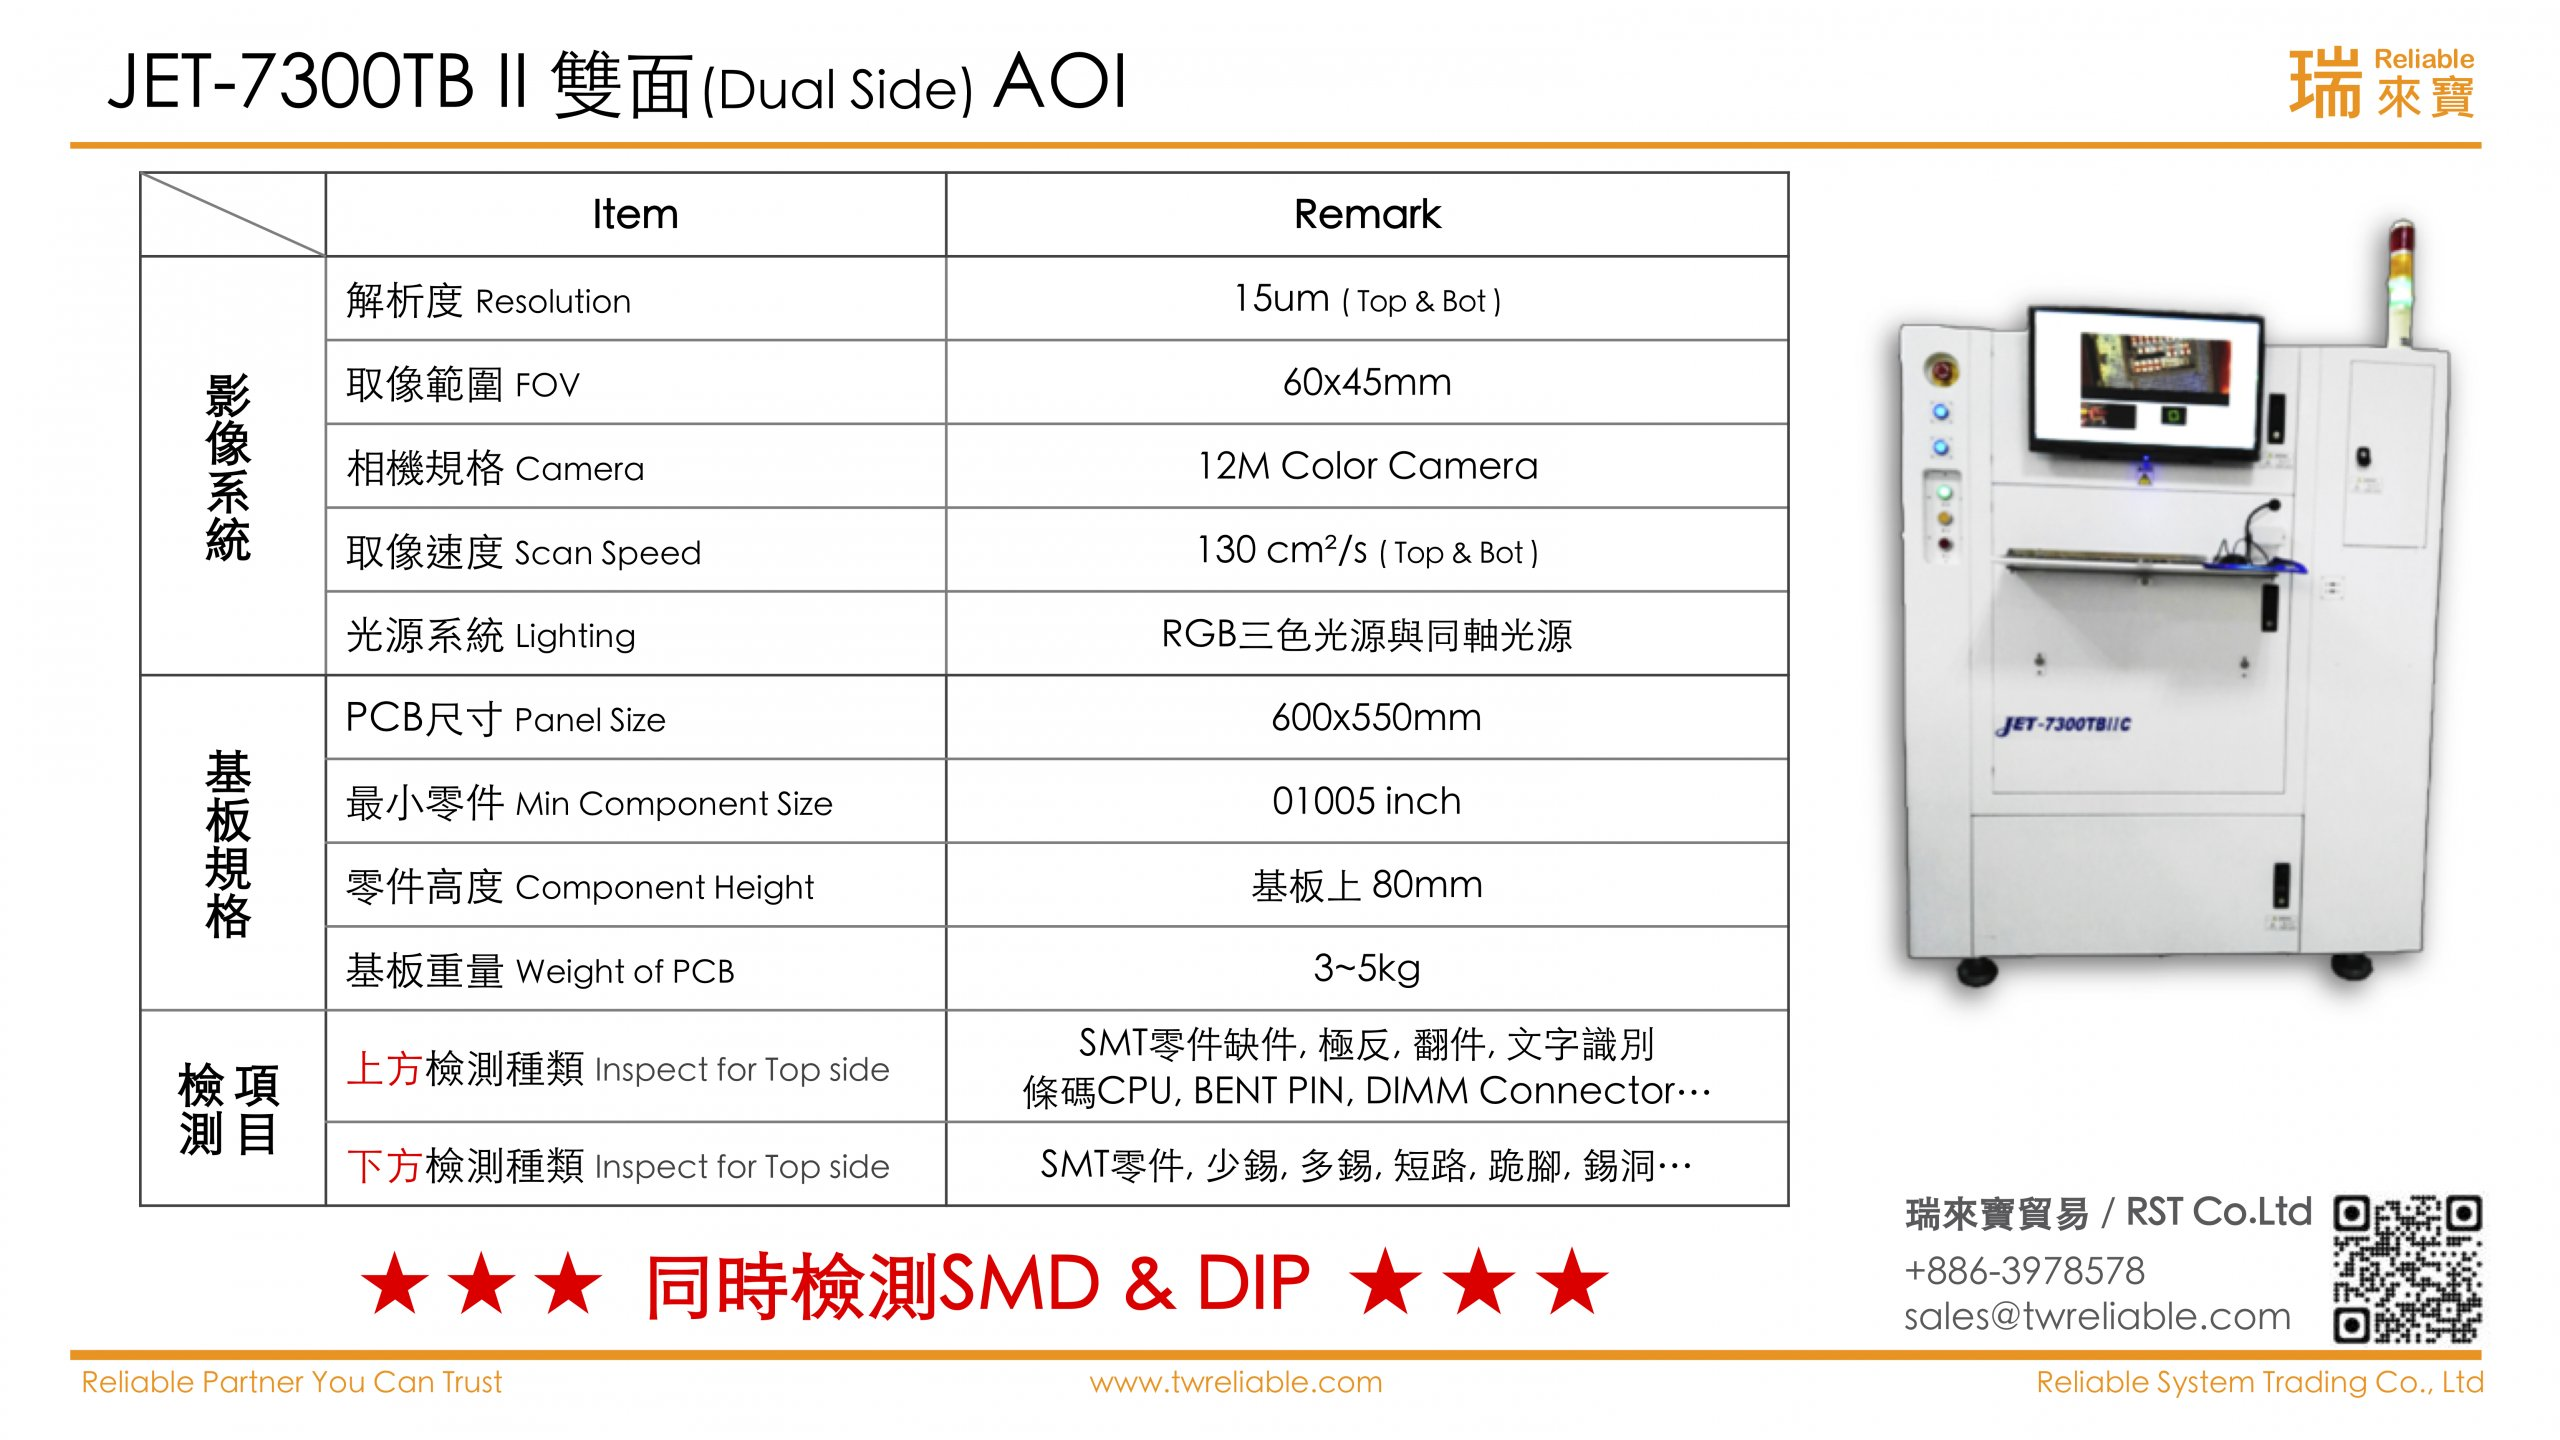 RST-Dual Side AOI_JET 7300TB